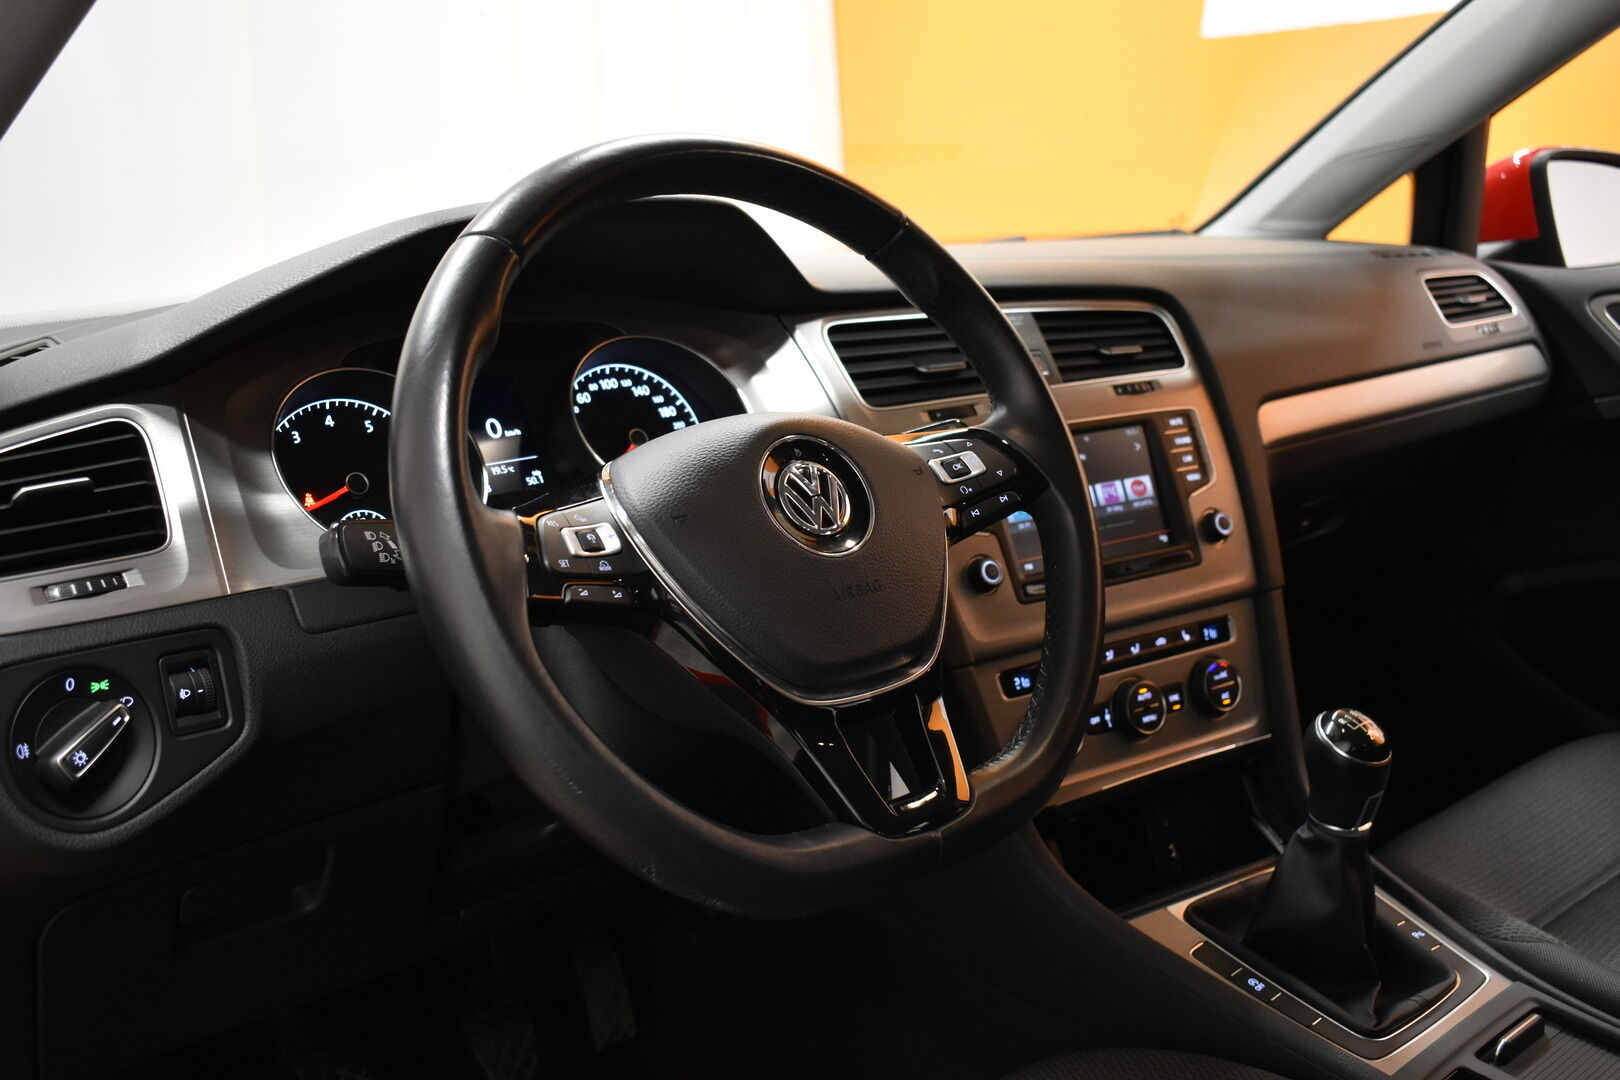 Punainen Farmari, Volkswagen Golf – LEM-79340, kuva 12